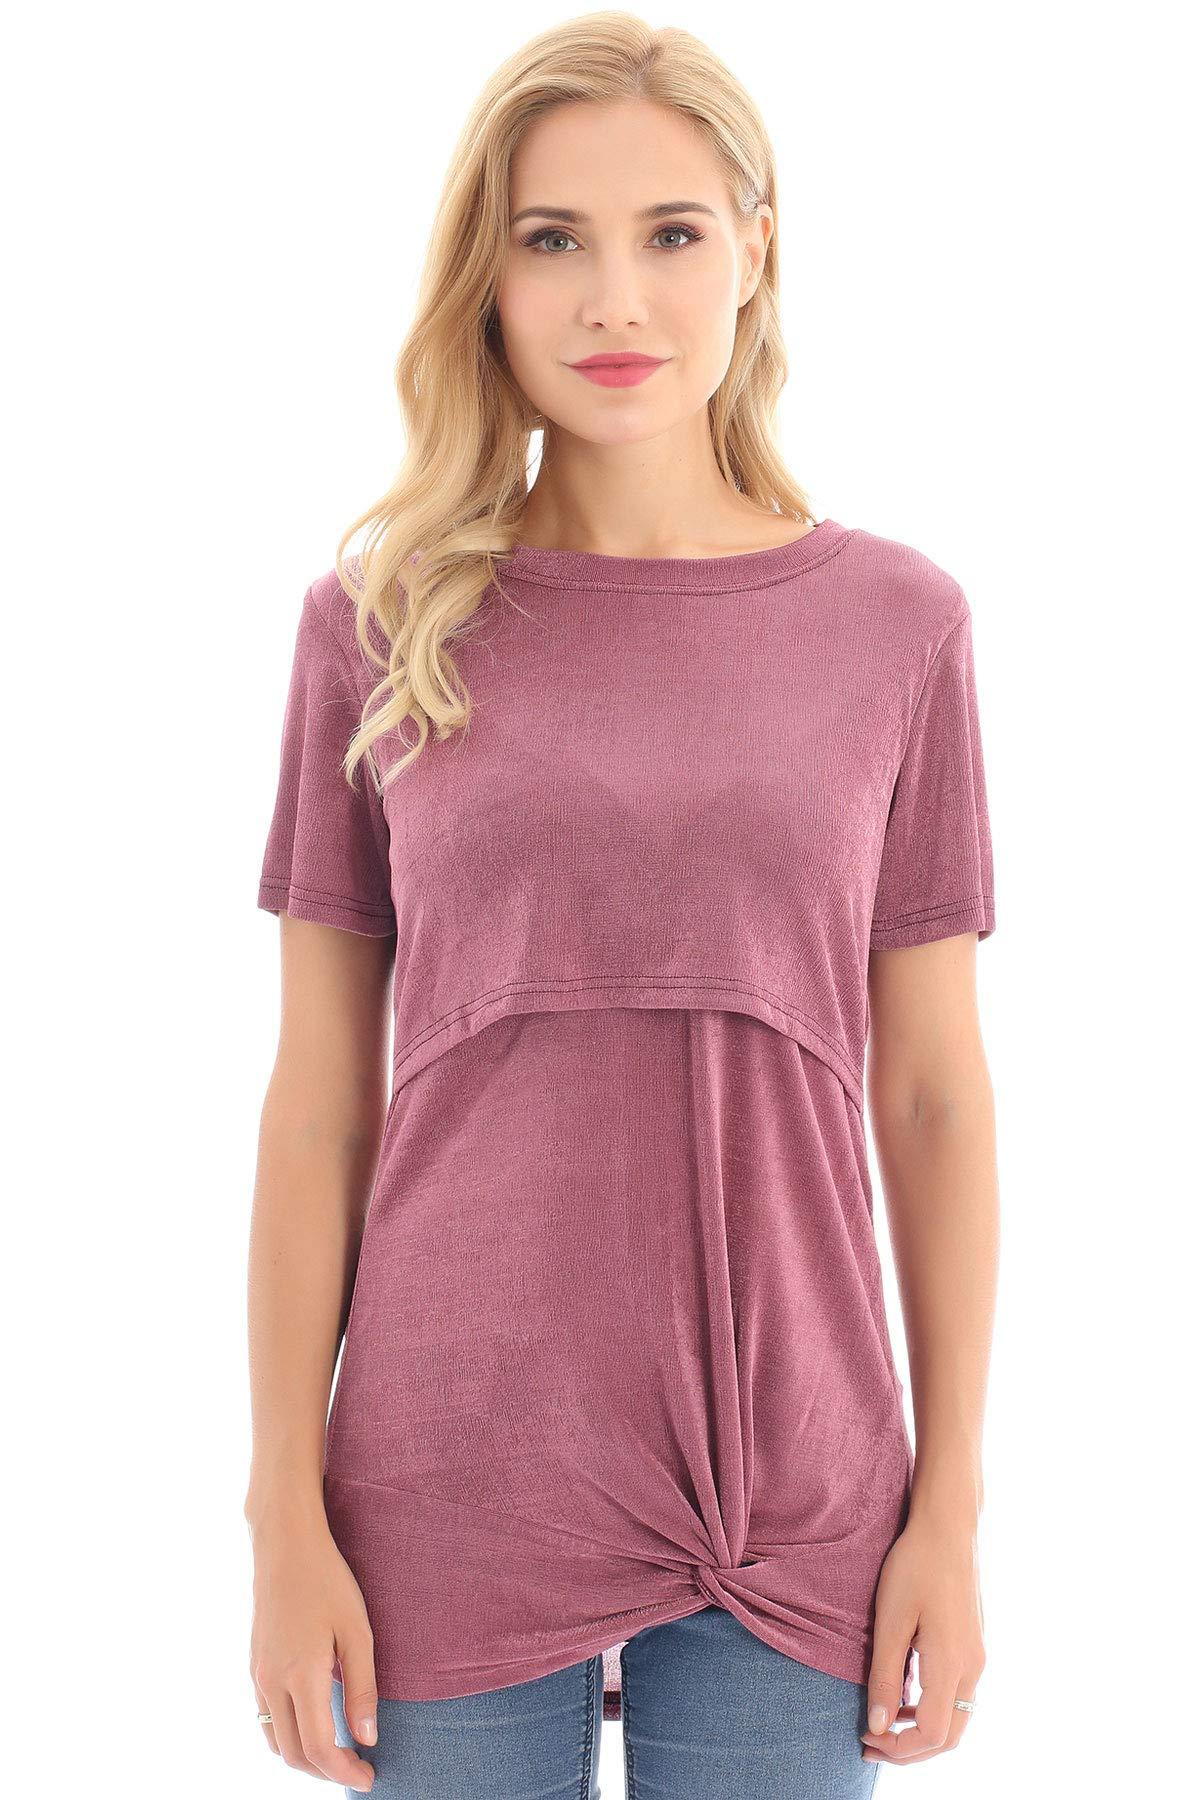 Bearsland Women's Short Sleeve Nursing Tops for Breastfeeding Tee Shirts Double Layer Pregnancy Shirt